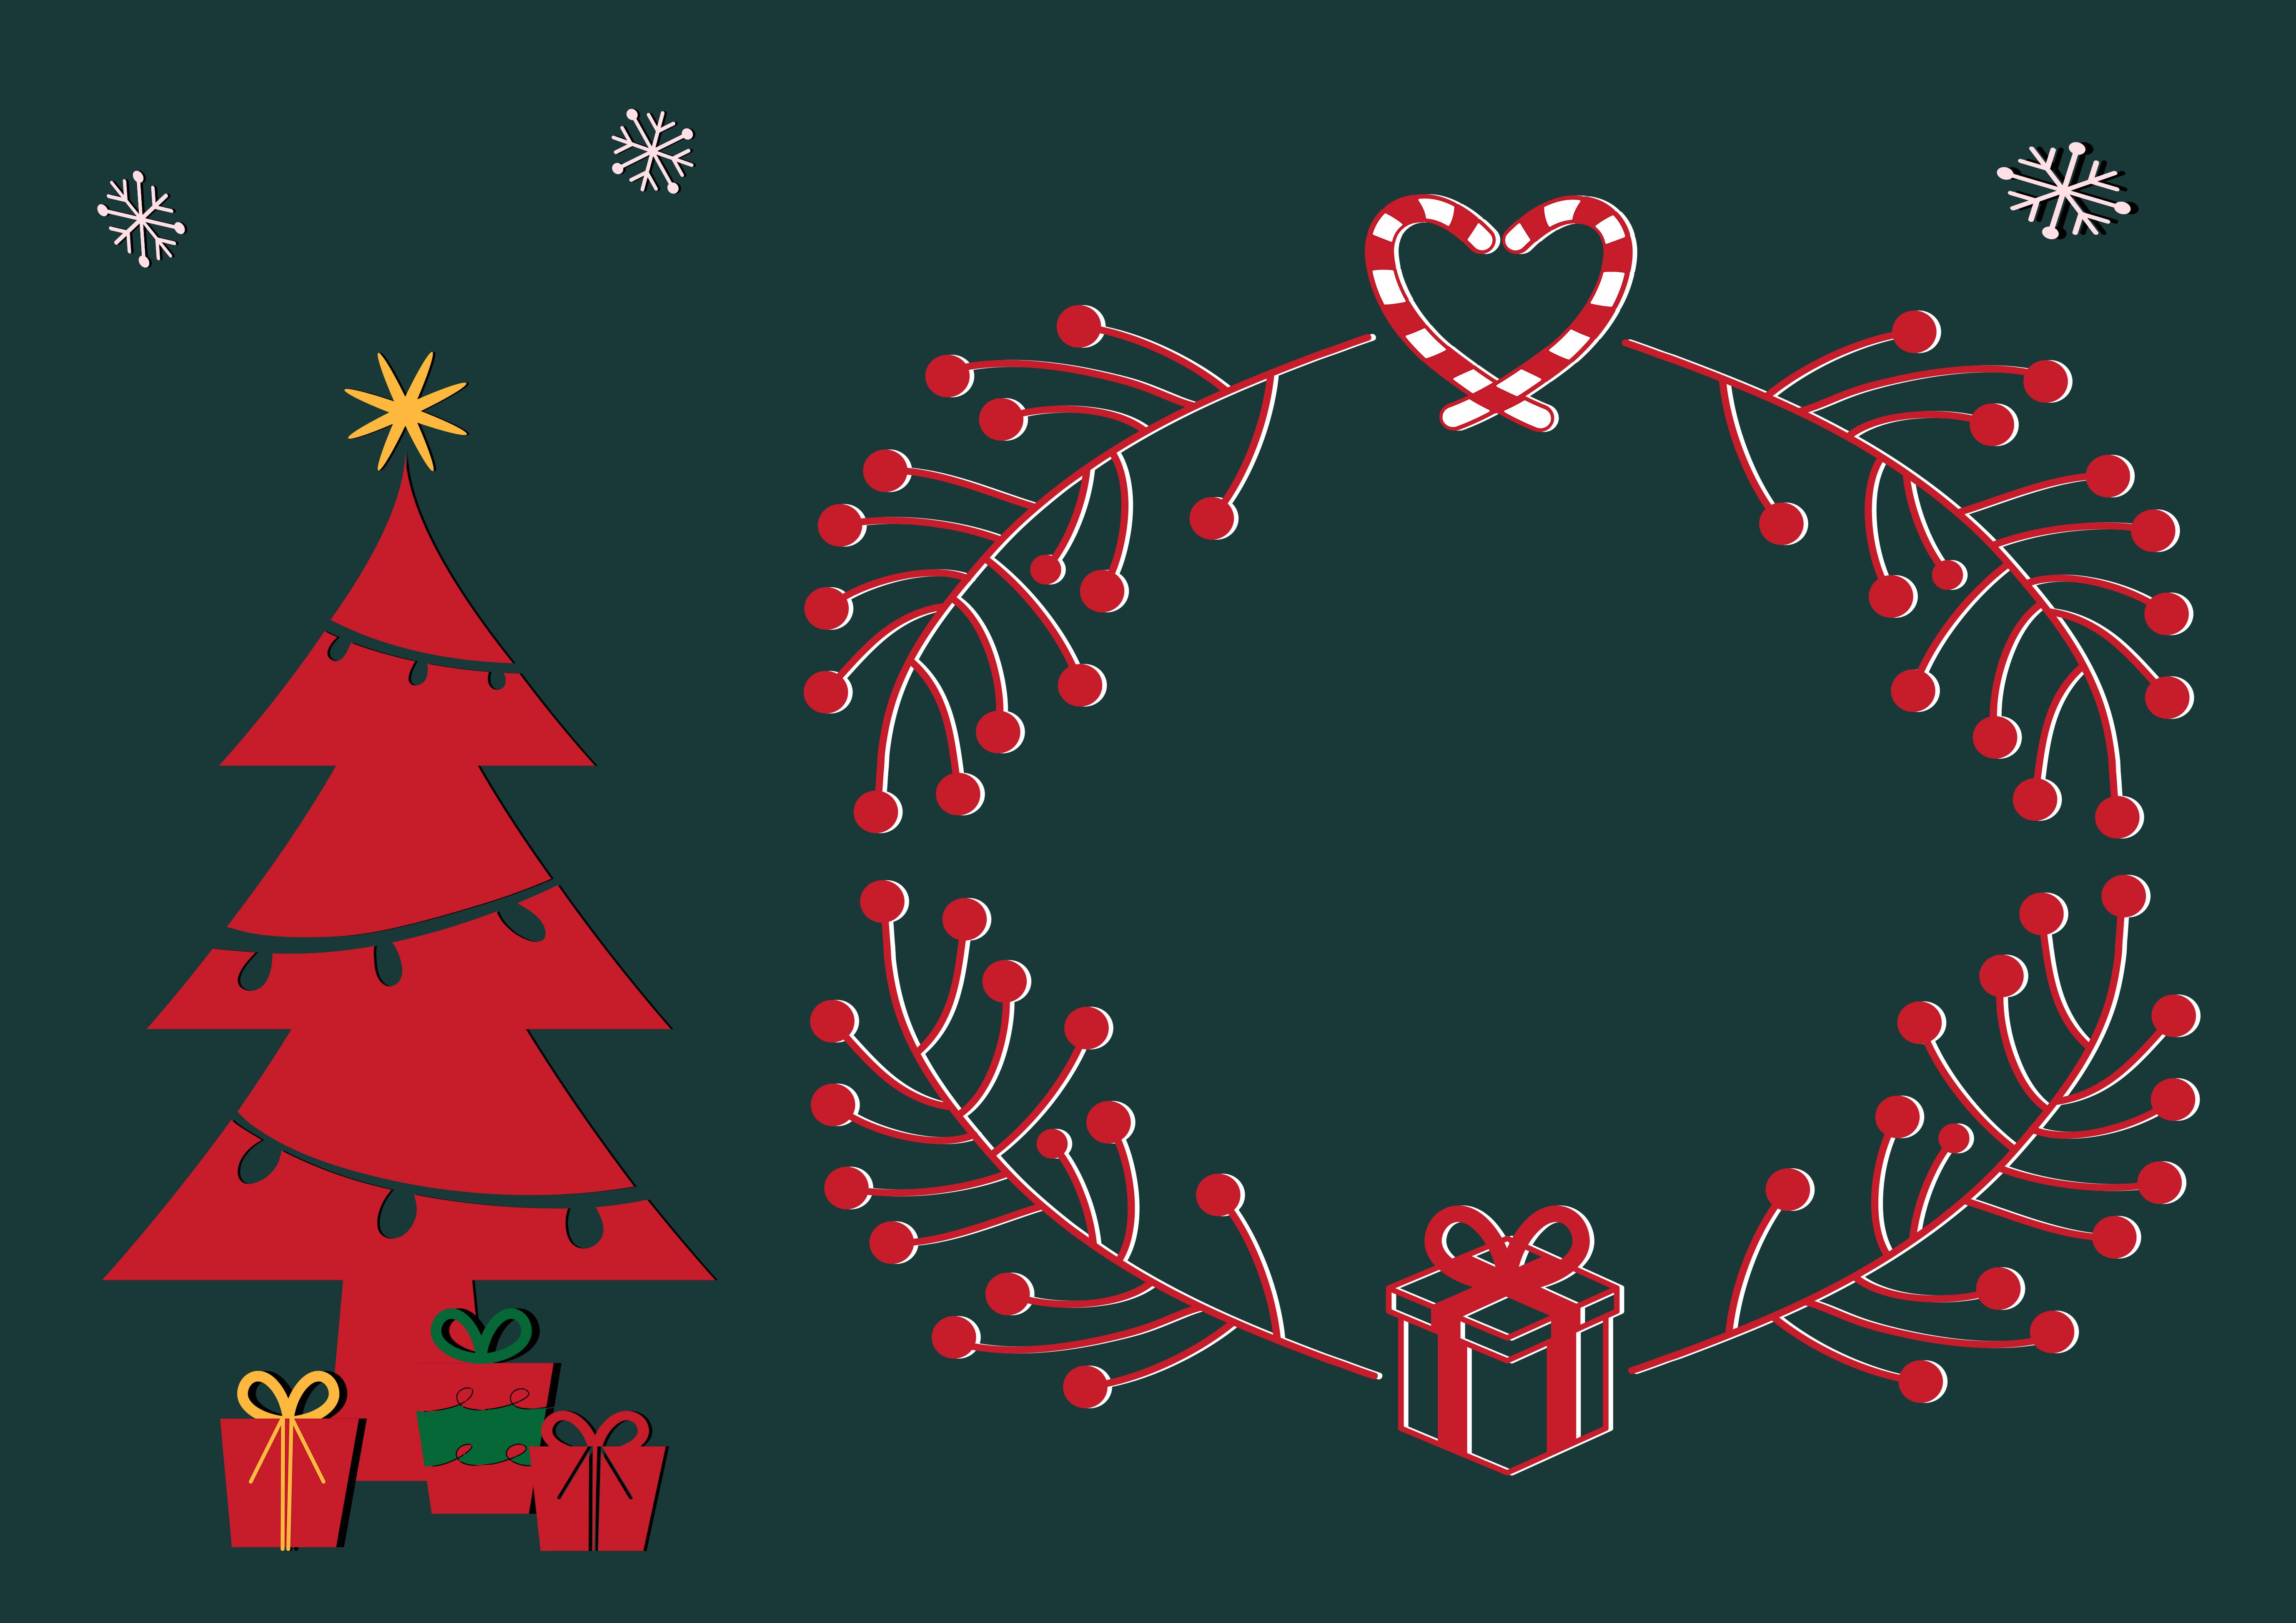 Moderne Christbaumkugeln.Free Images Christmas Motif Christmas Card Modern Frame